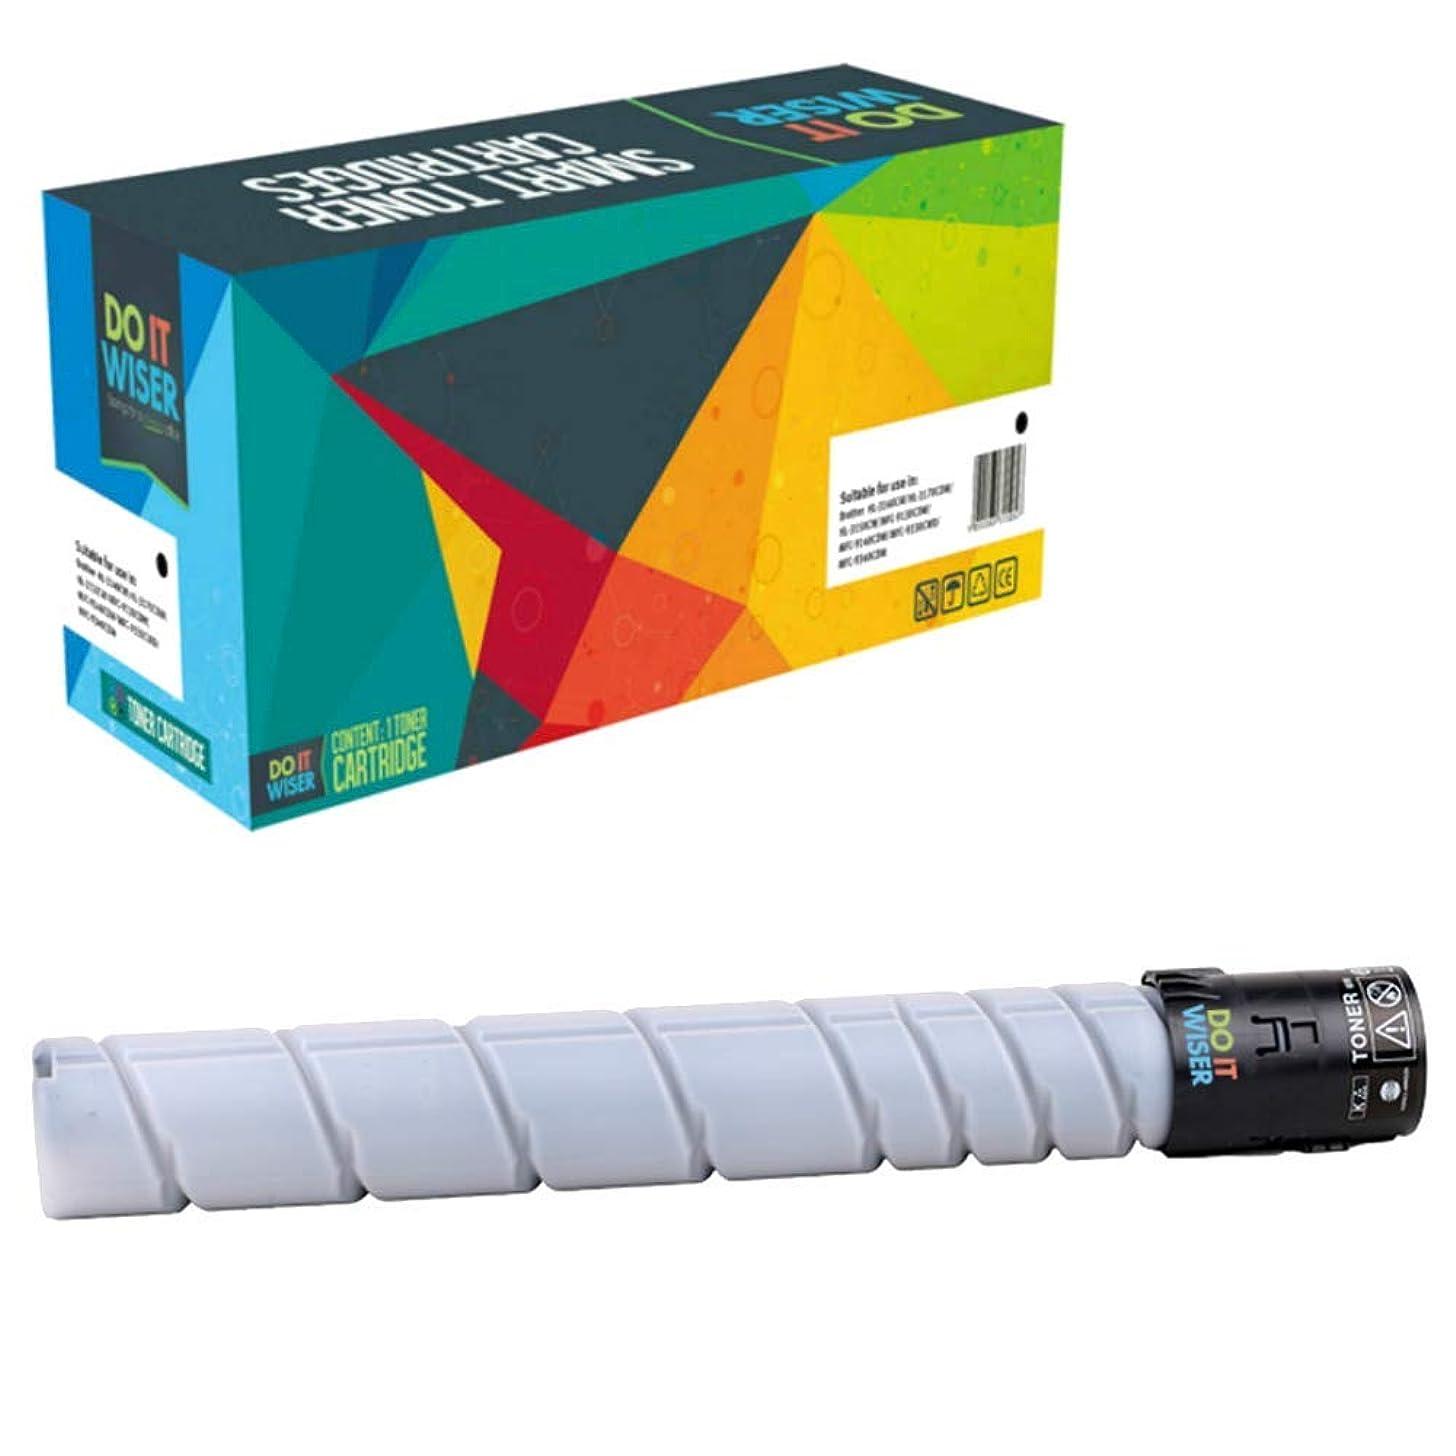 Do it Wiser Compatible TN324K Konica Bizhub C258 C308 C368 Toner - Black